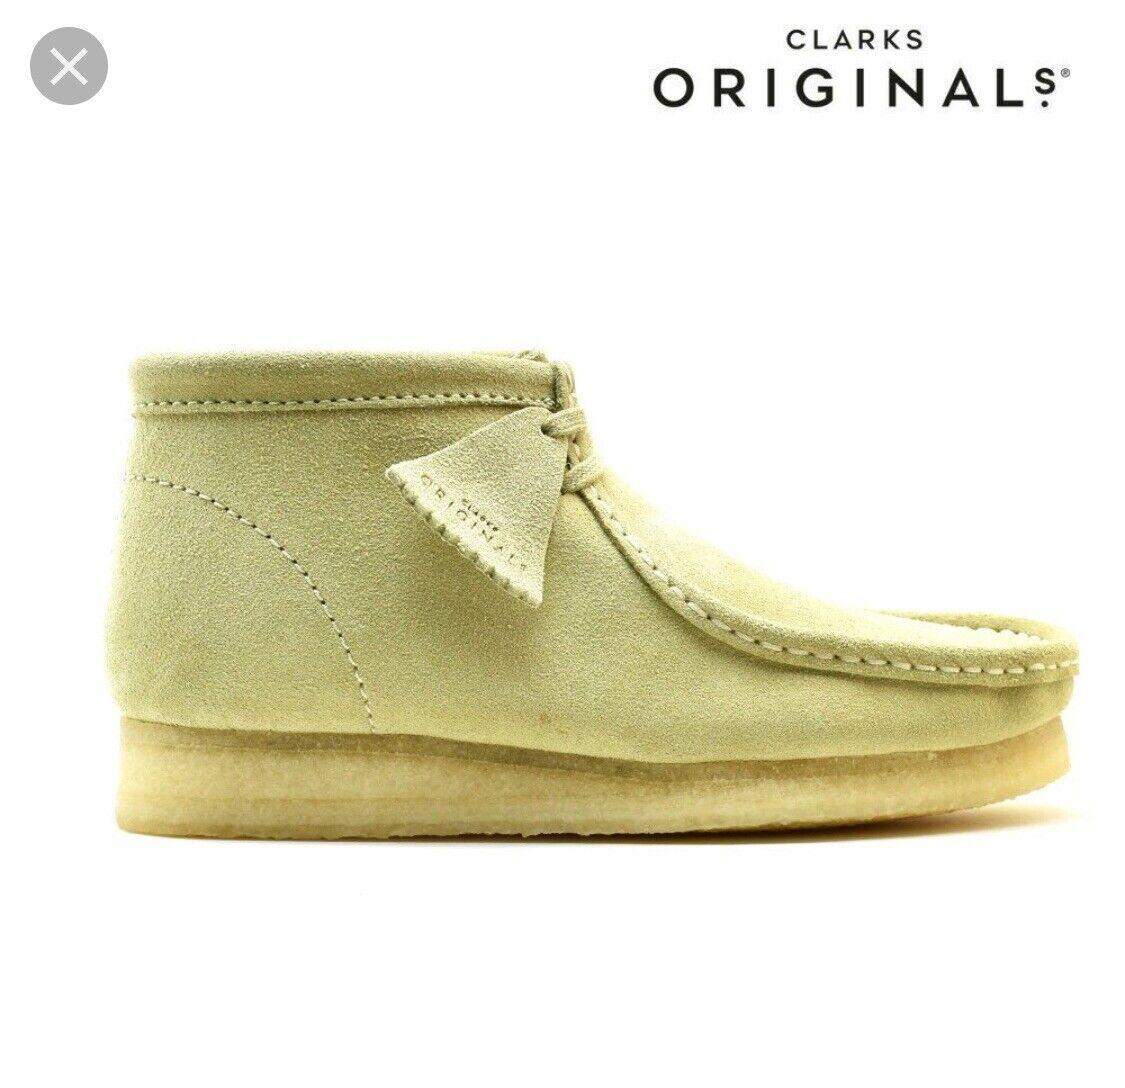 Clarks Wallabee Suede Boots. Originals. Men's Sizes. 26133283